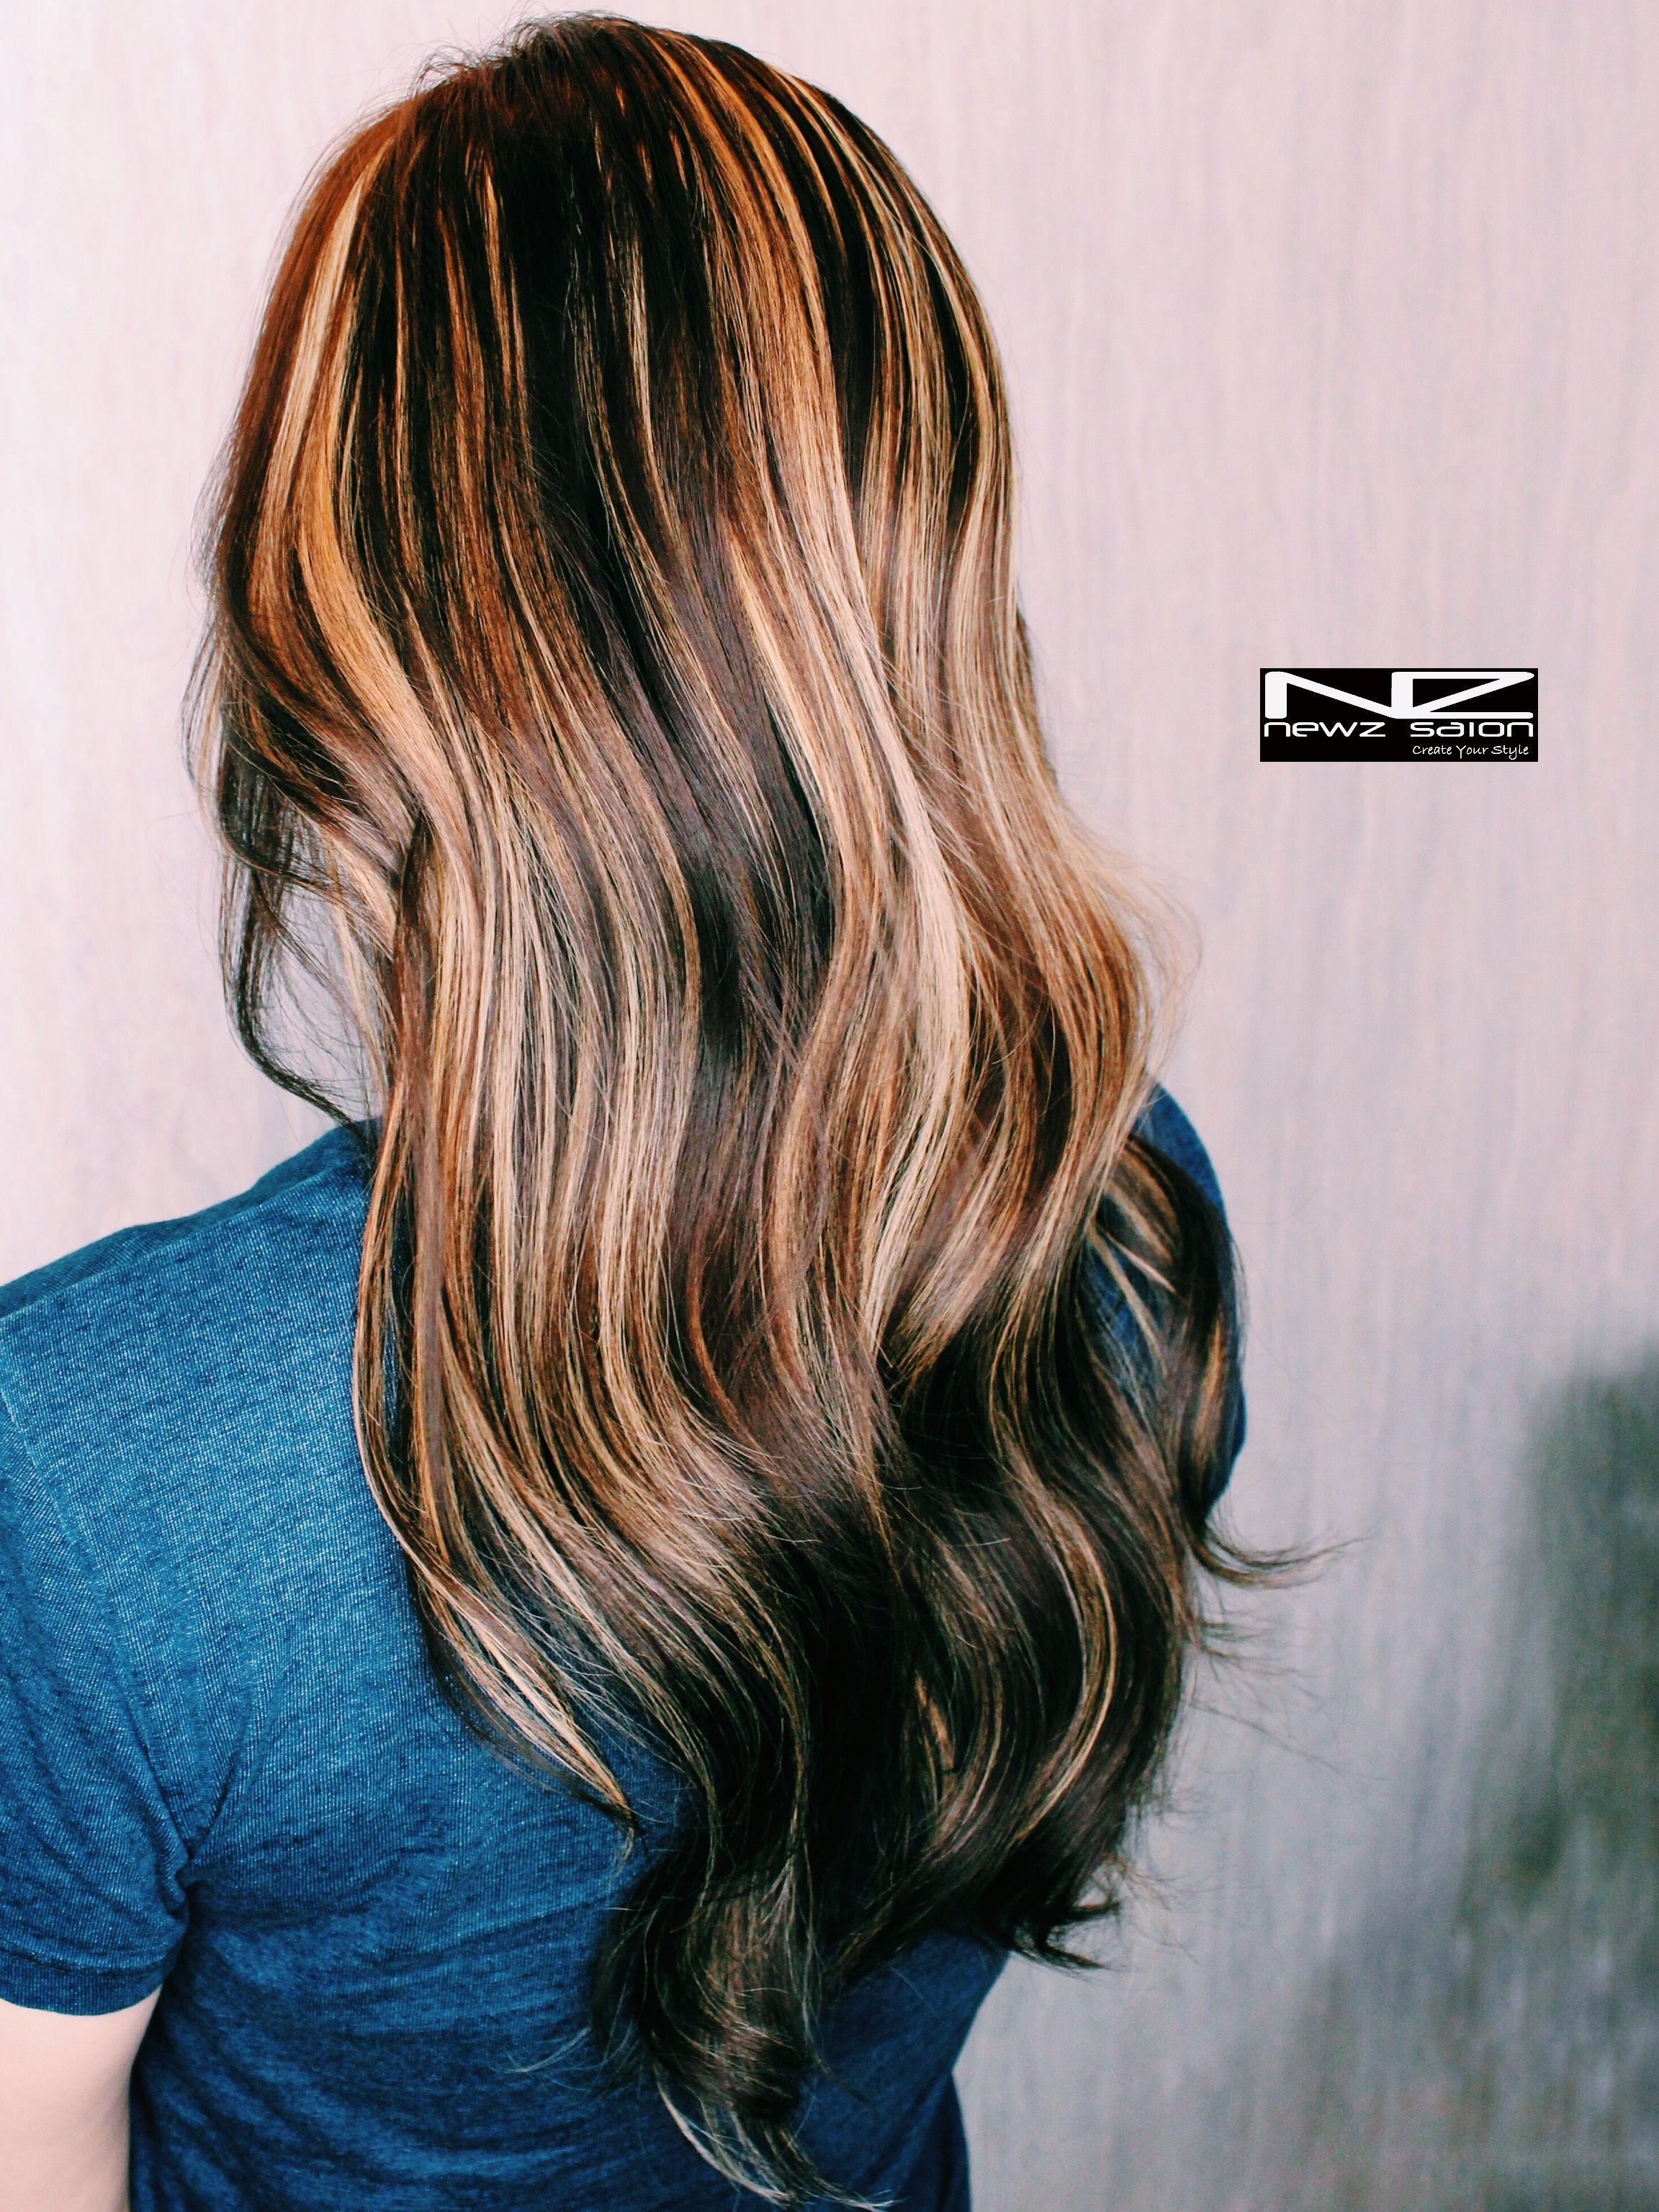 Balayage Ombre dip dye Hair Coloring Newz salon & nz hair